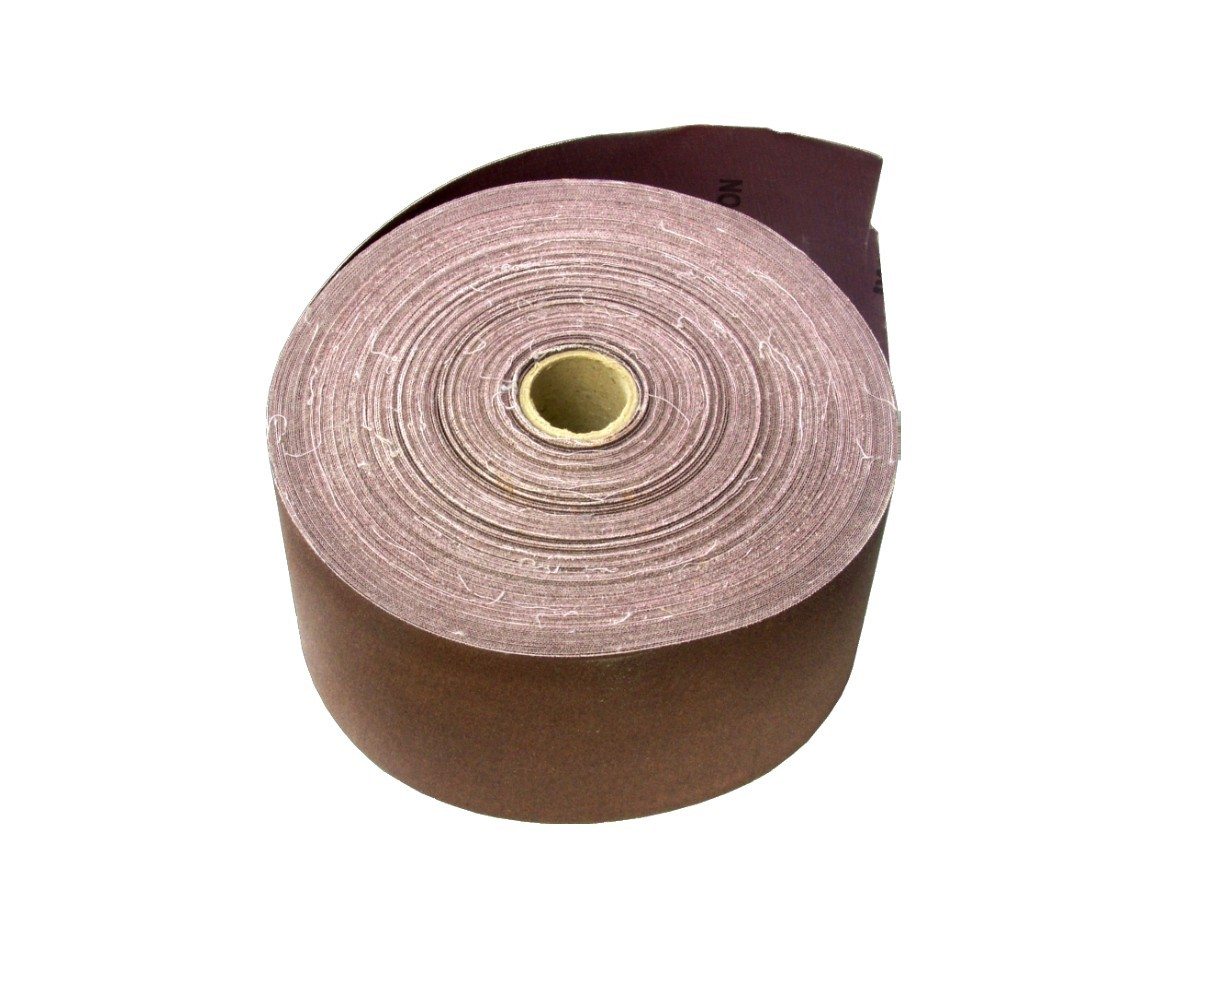 Smirghel Universal pe Suport Textil ETS Lungime 50m, Latime 100mm, Granulatie 120 imagine techstar.ro 2021